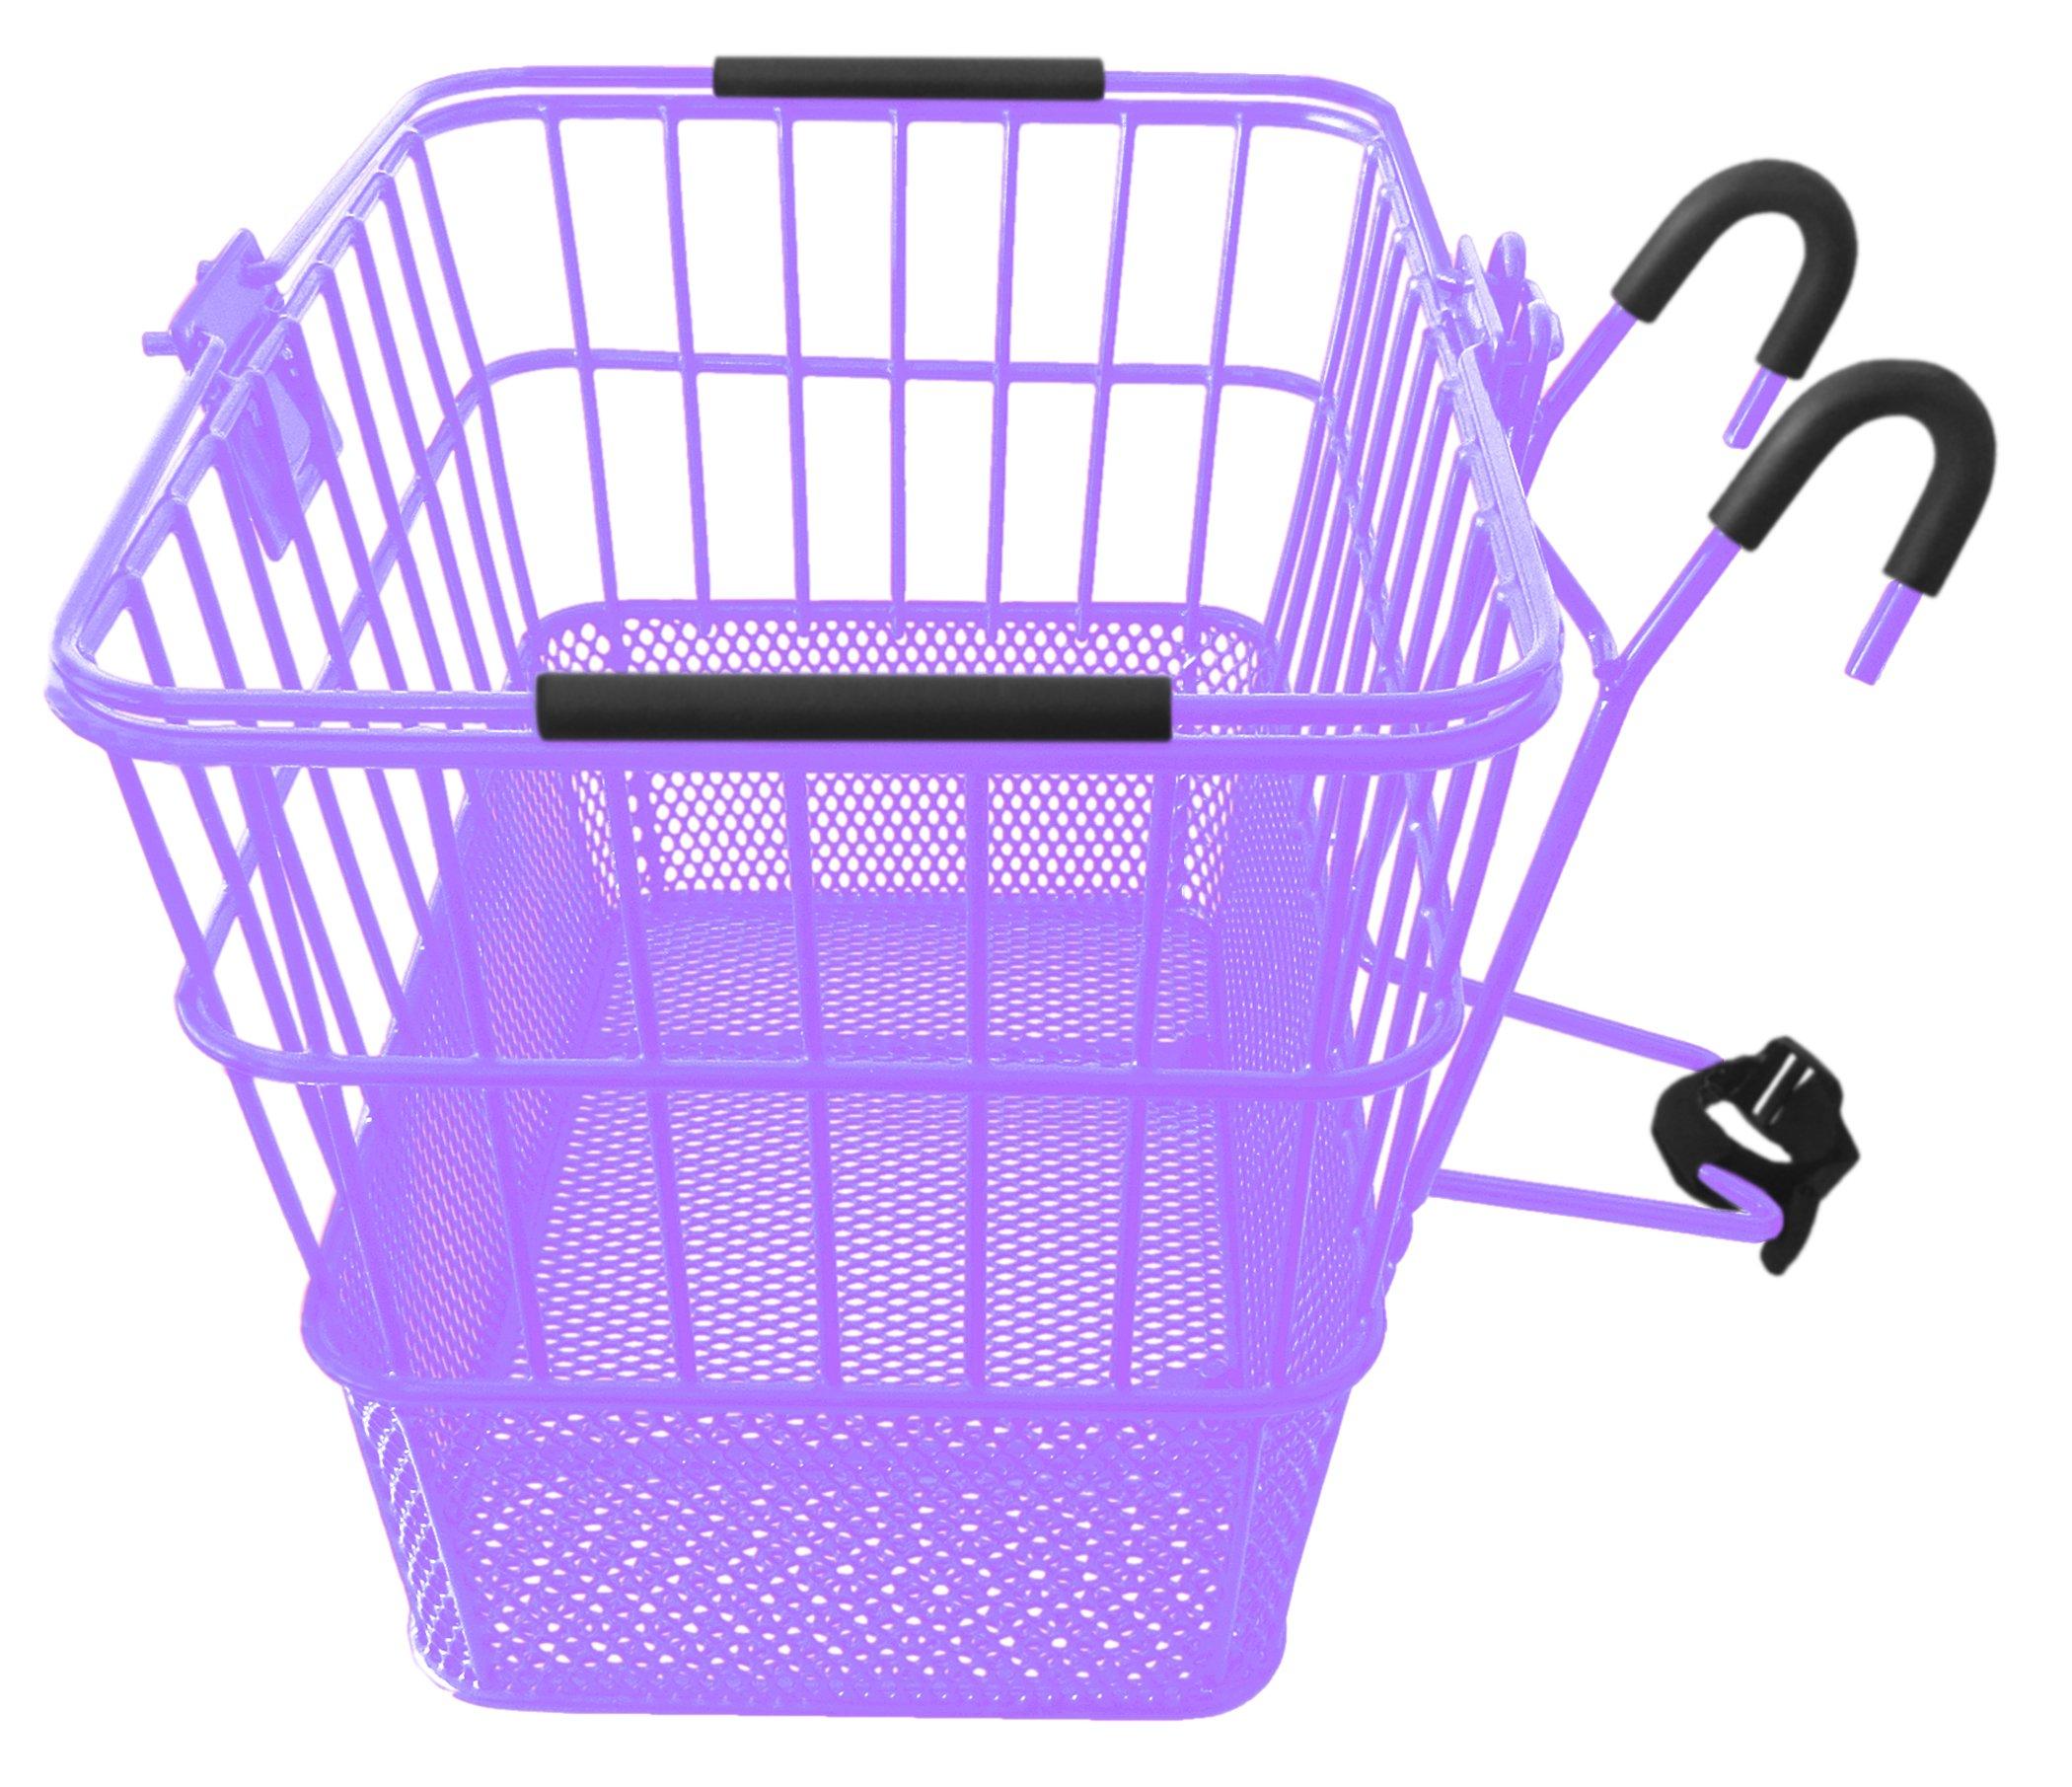 Mesh Bottom Lift-Off Basket w/ Bracket, Purple